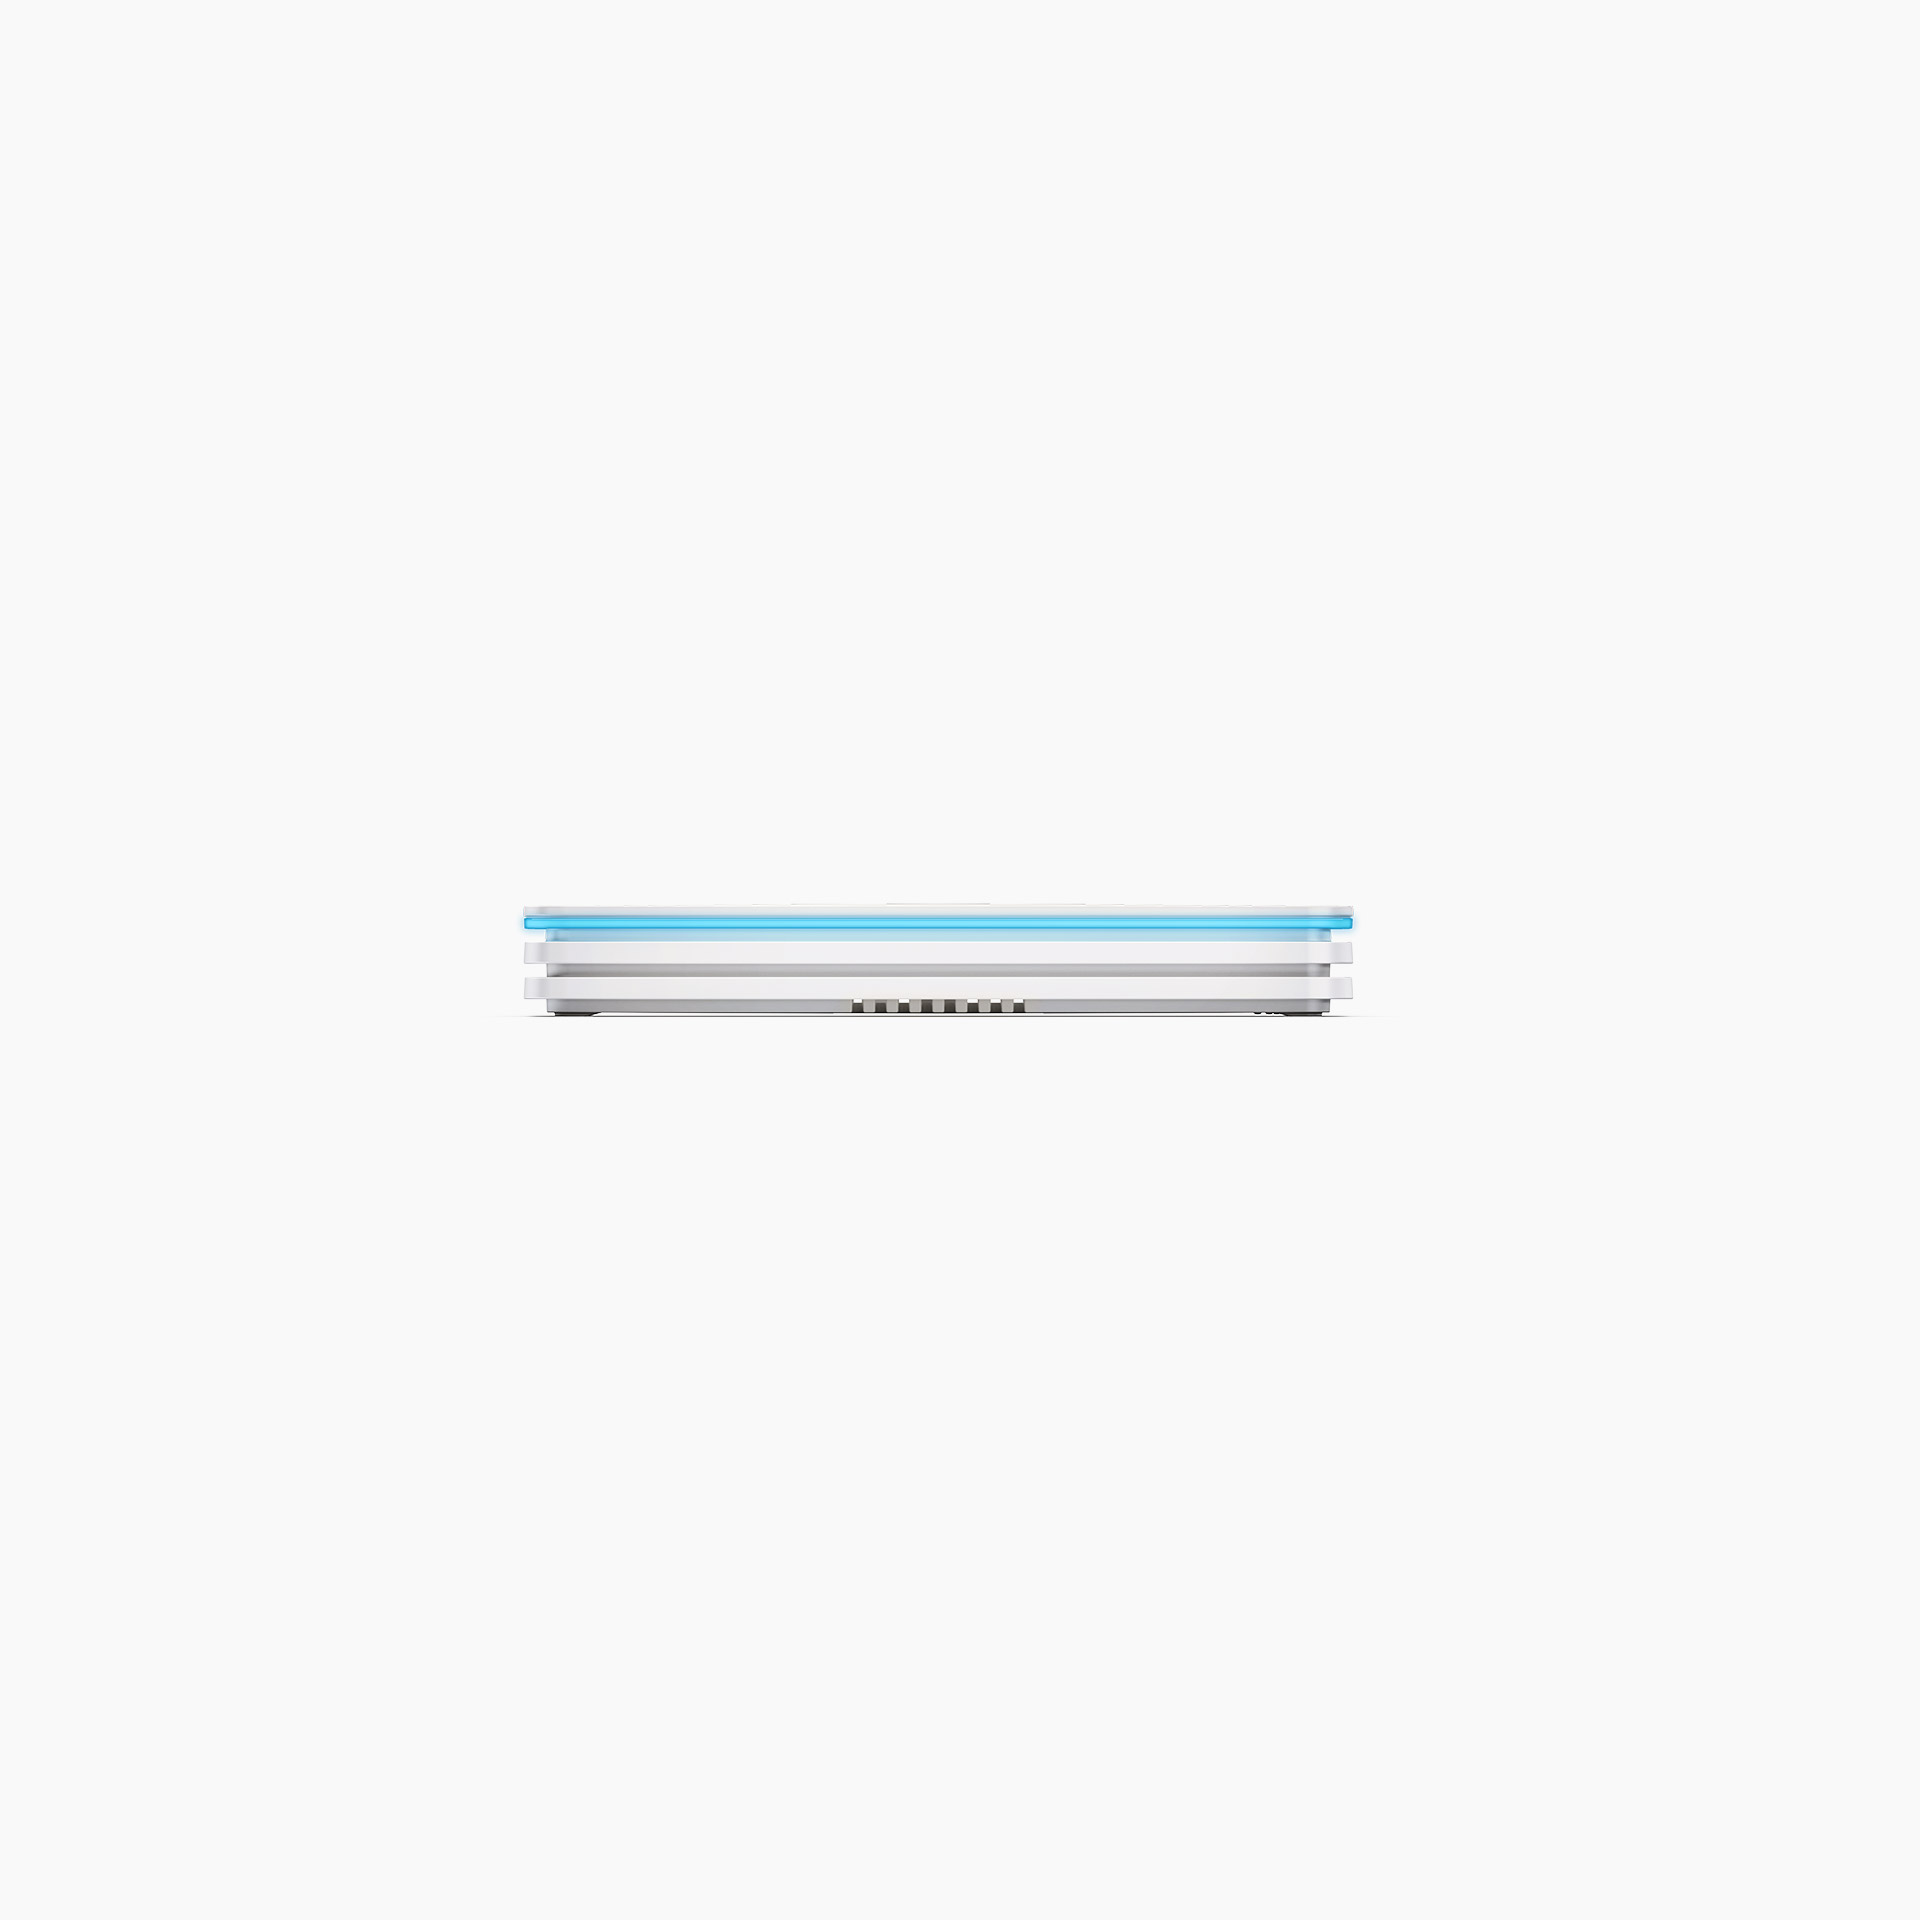 AS150 AirSense Pro